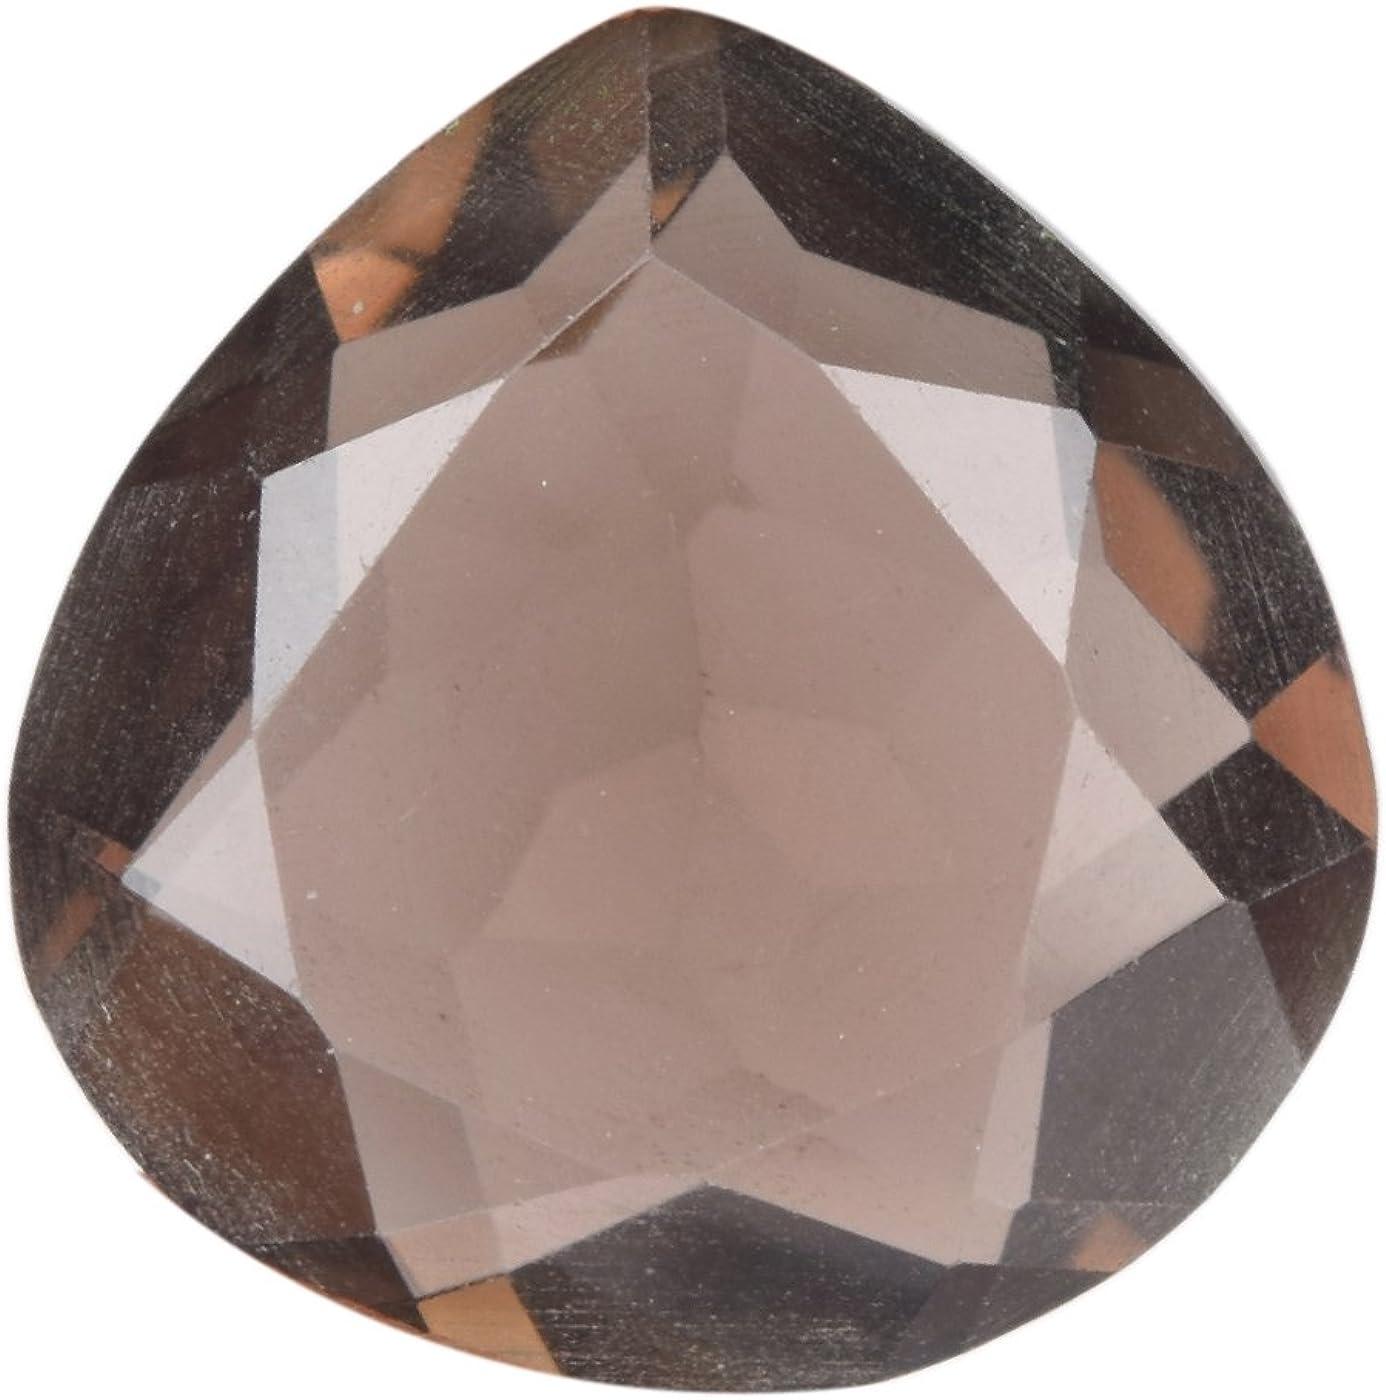 Gemhub Topacio Ahumado con Forma de pera 67,50 CT. Tallado Translúcido Colgante Tamaño Brasileño Marrón Topacio Piedras Preciosas BM-392